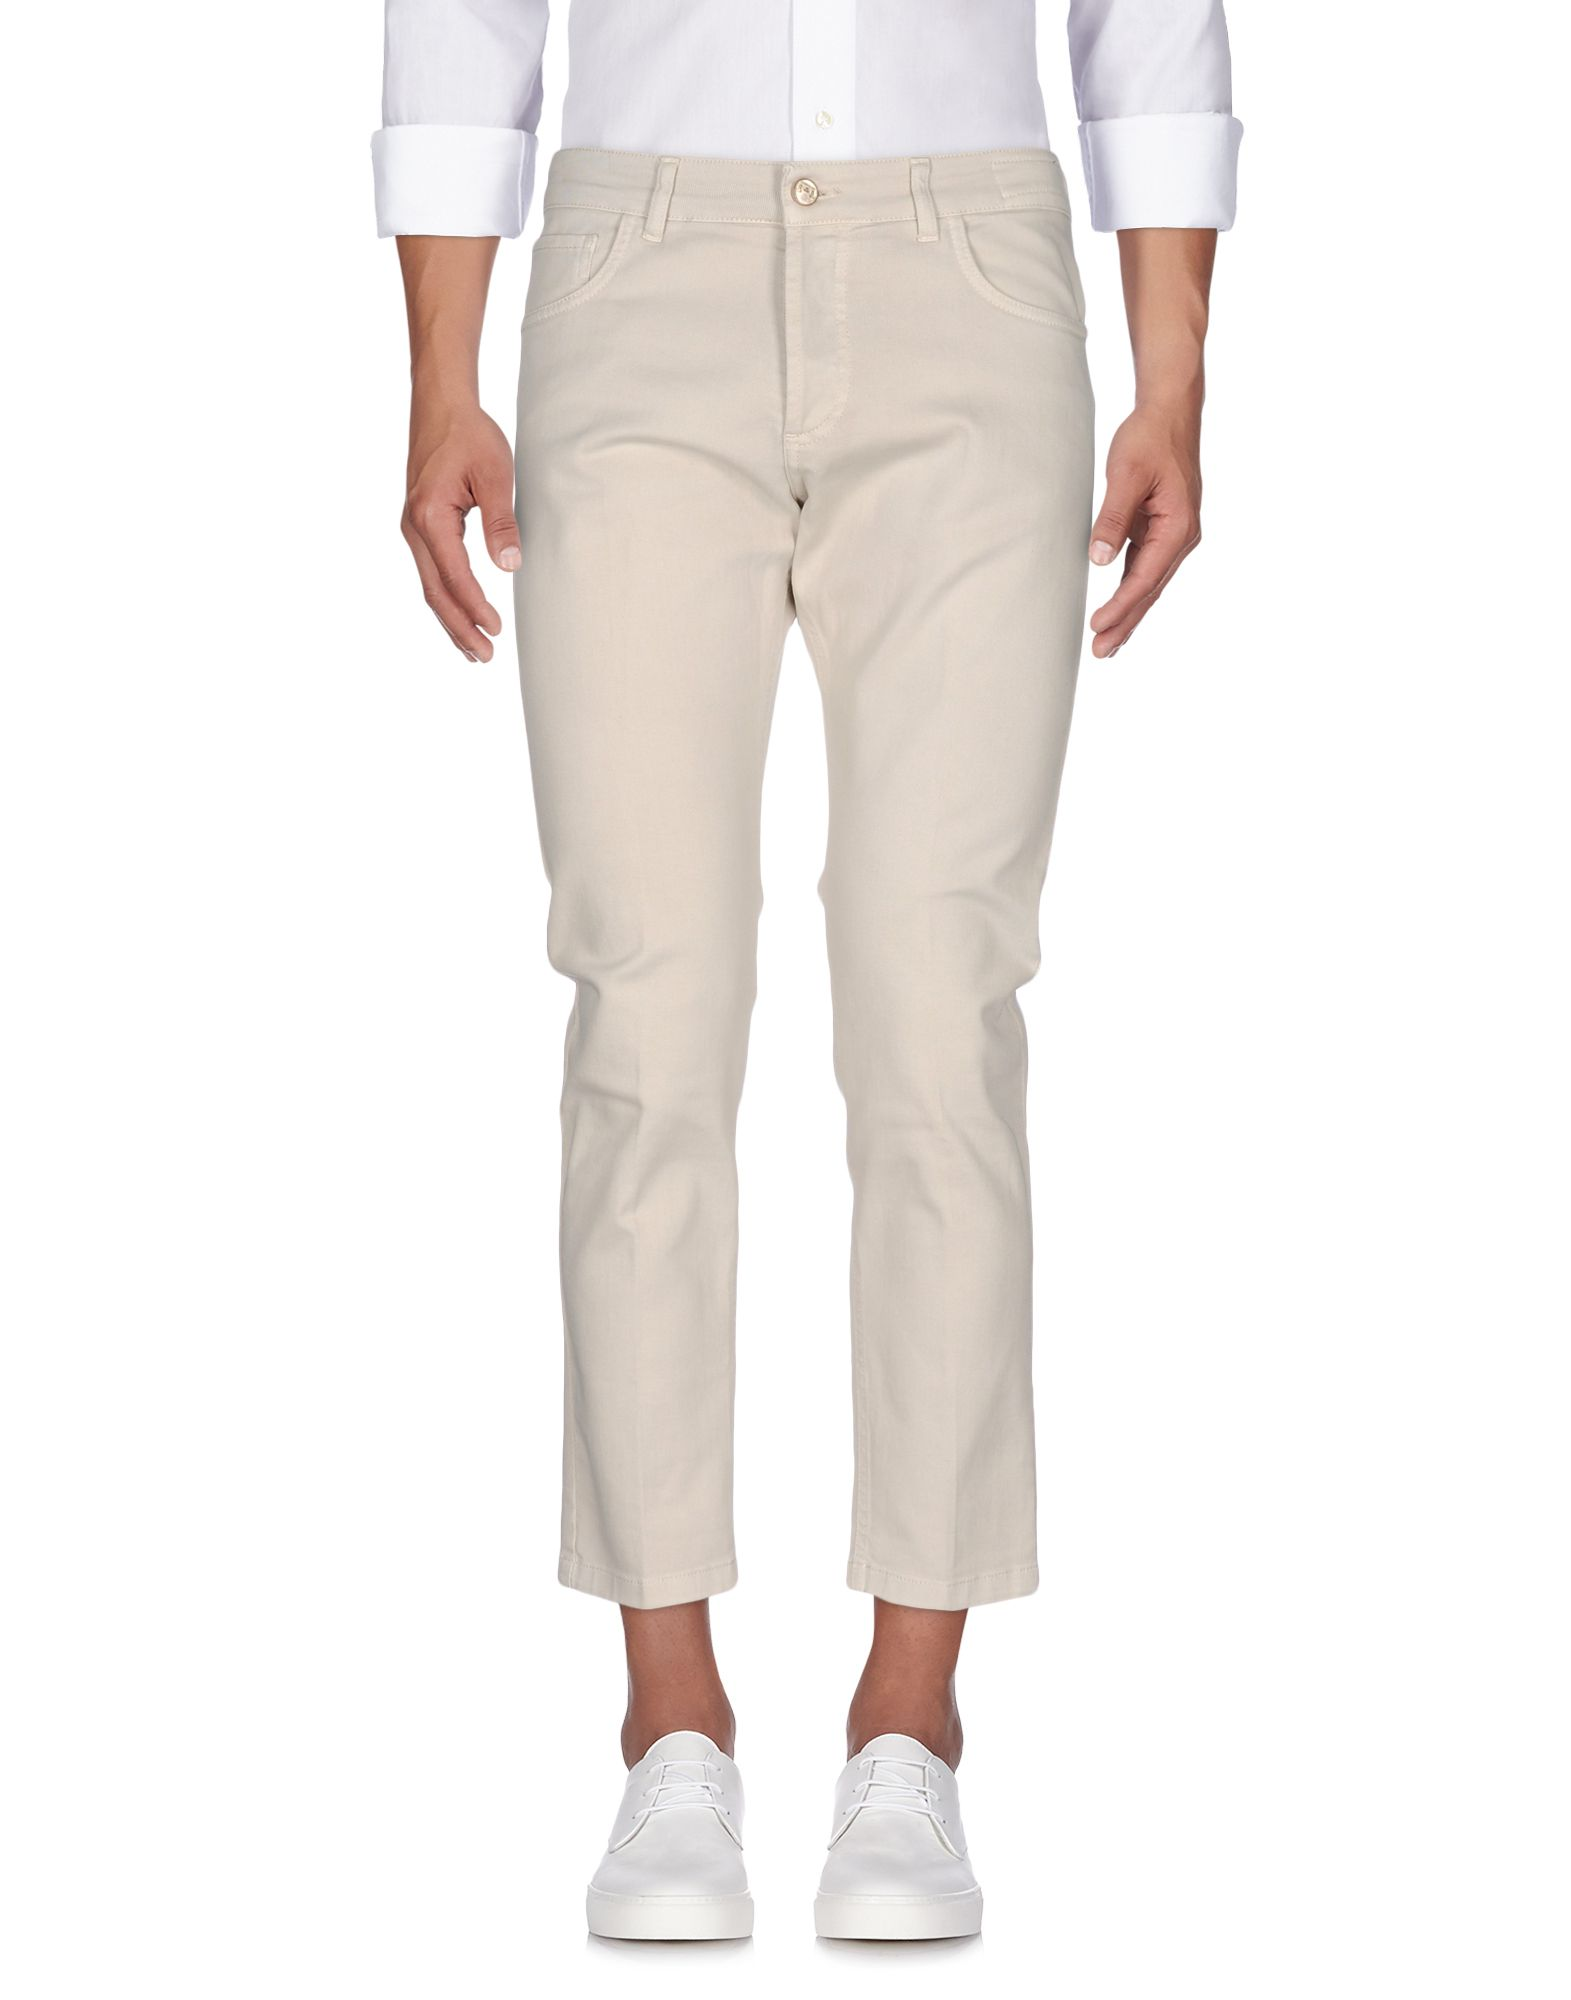 ENTRE AMIS Джинсовые брюки amis st30p white